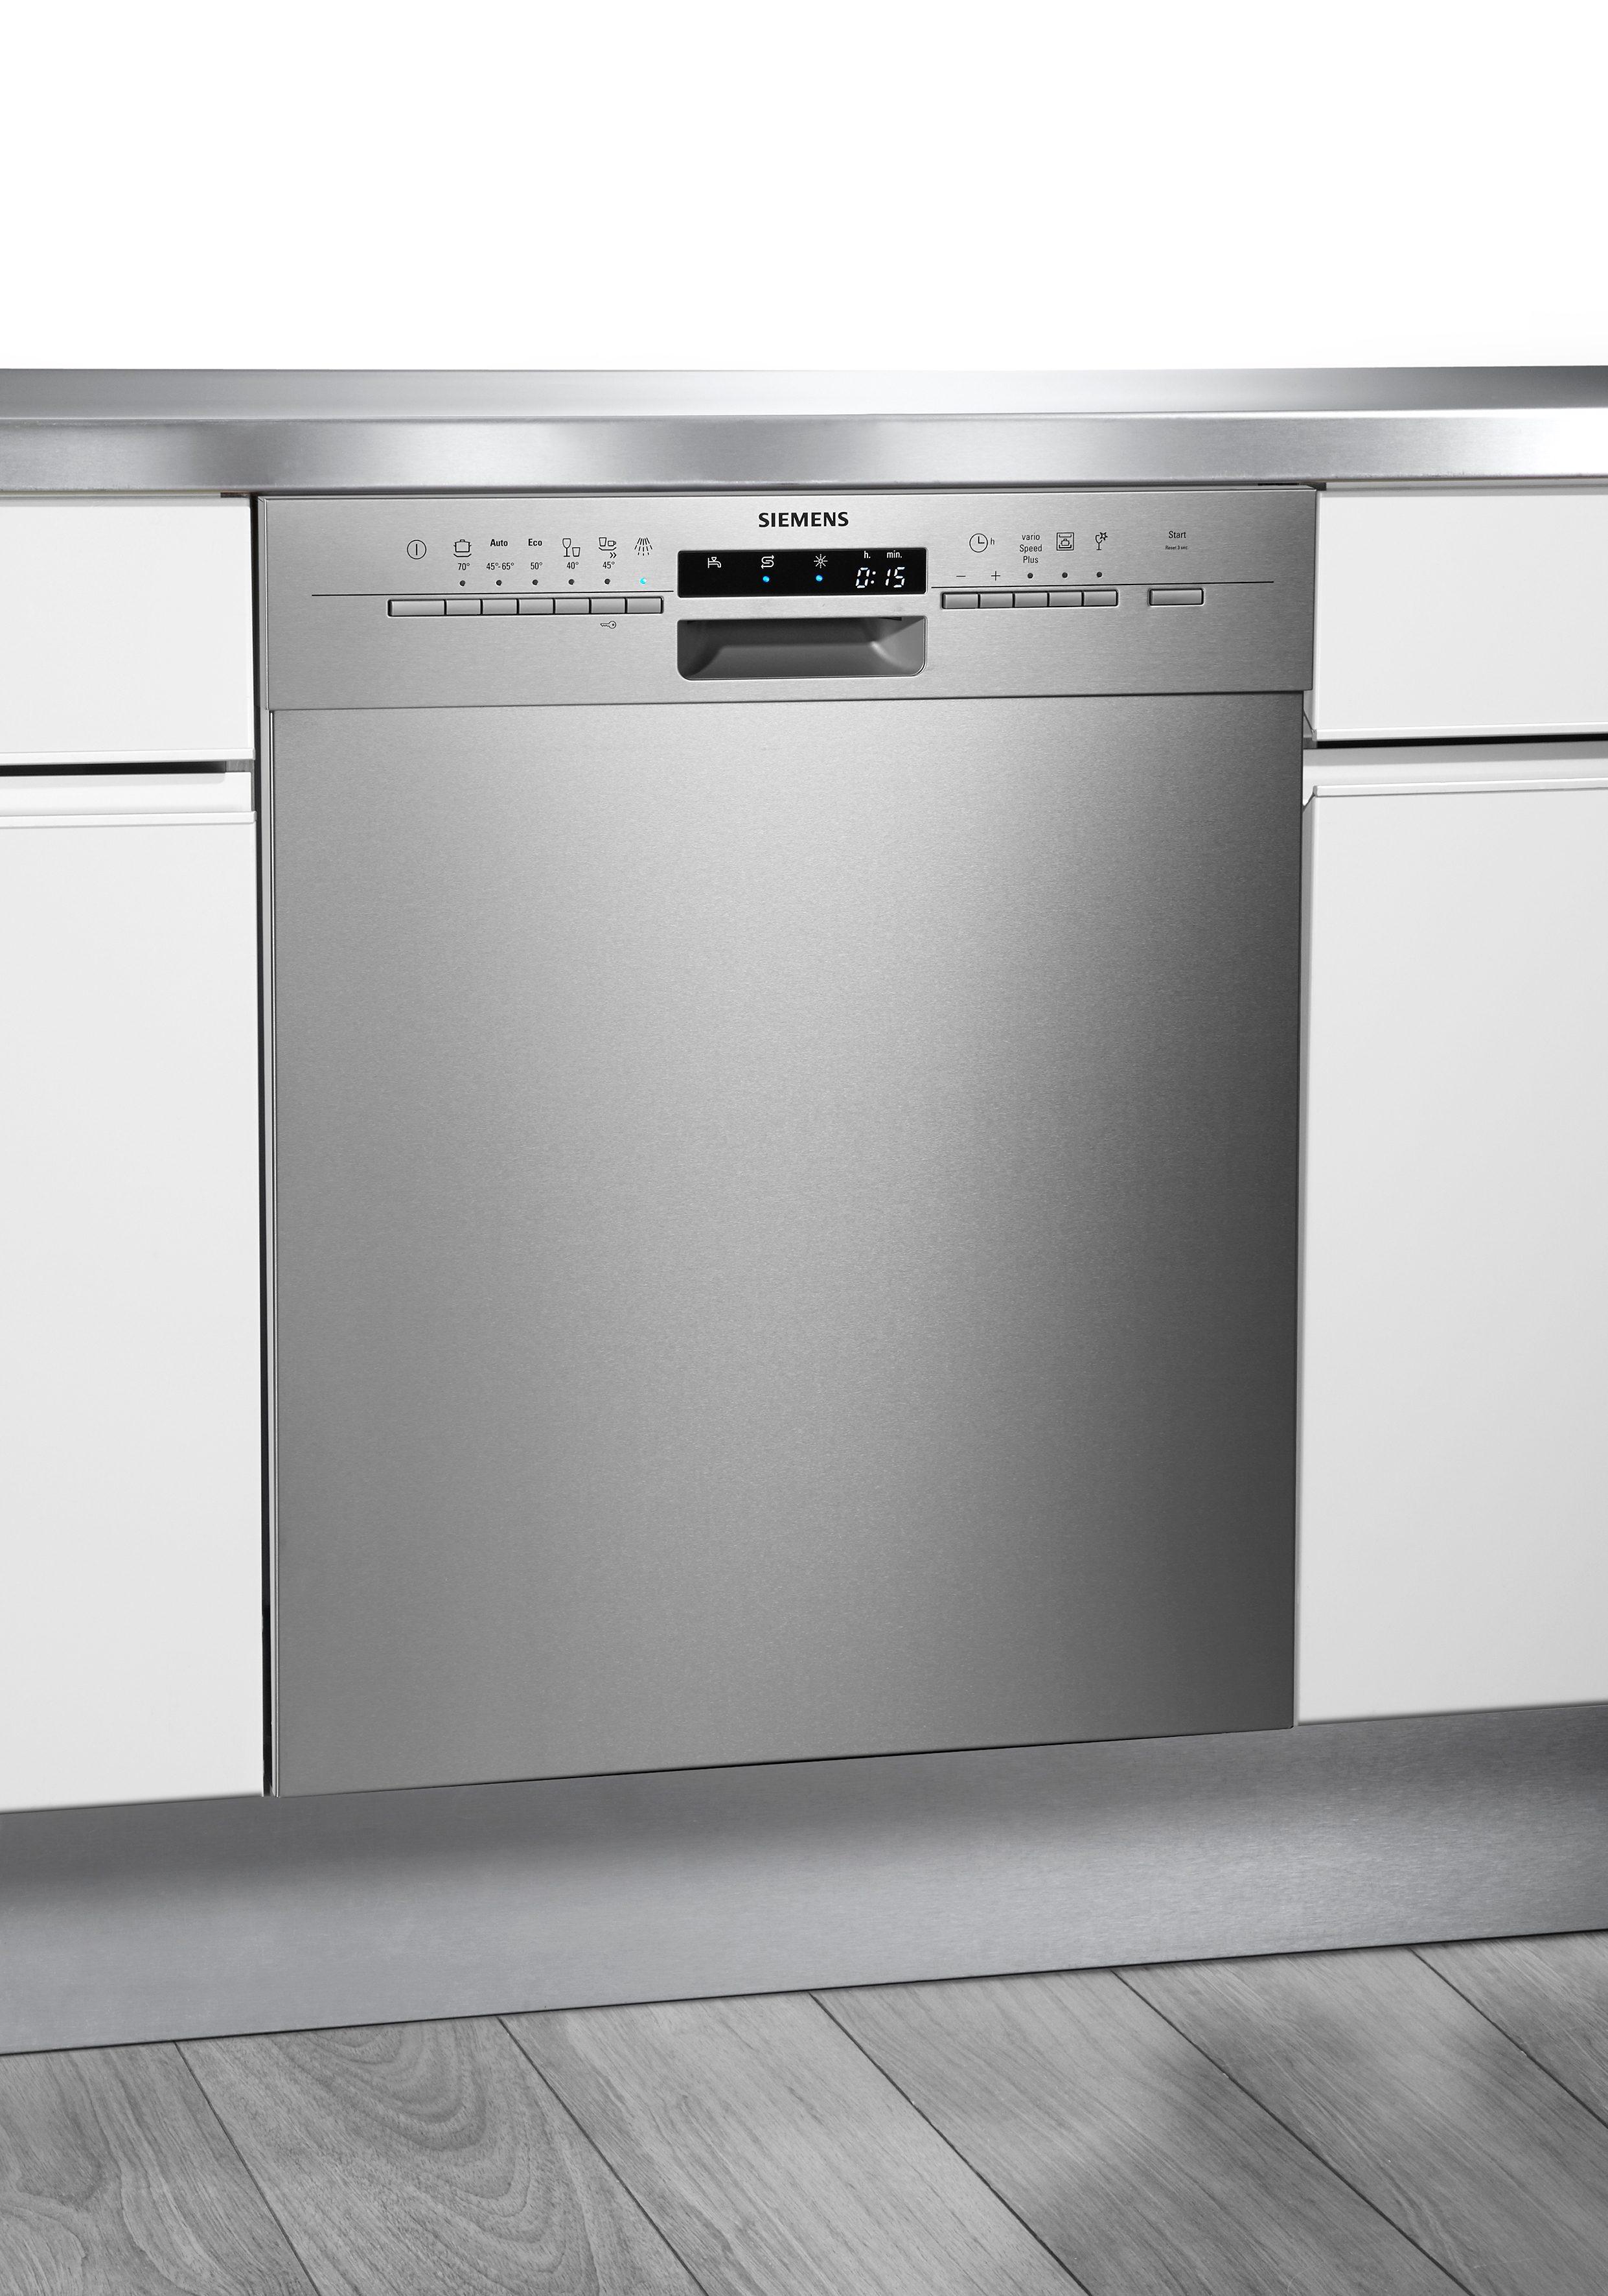 Siemens Unterbau-Geschirrspüler SN46P532EU, A+++, 9,5 Liter, 13 Maßgedecke